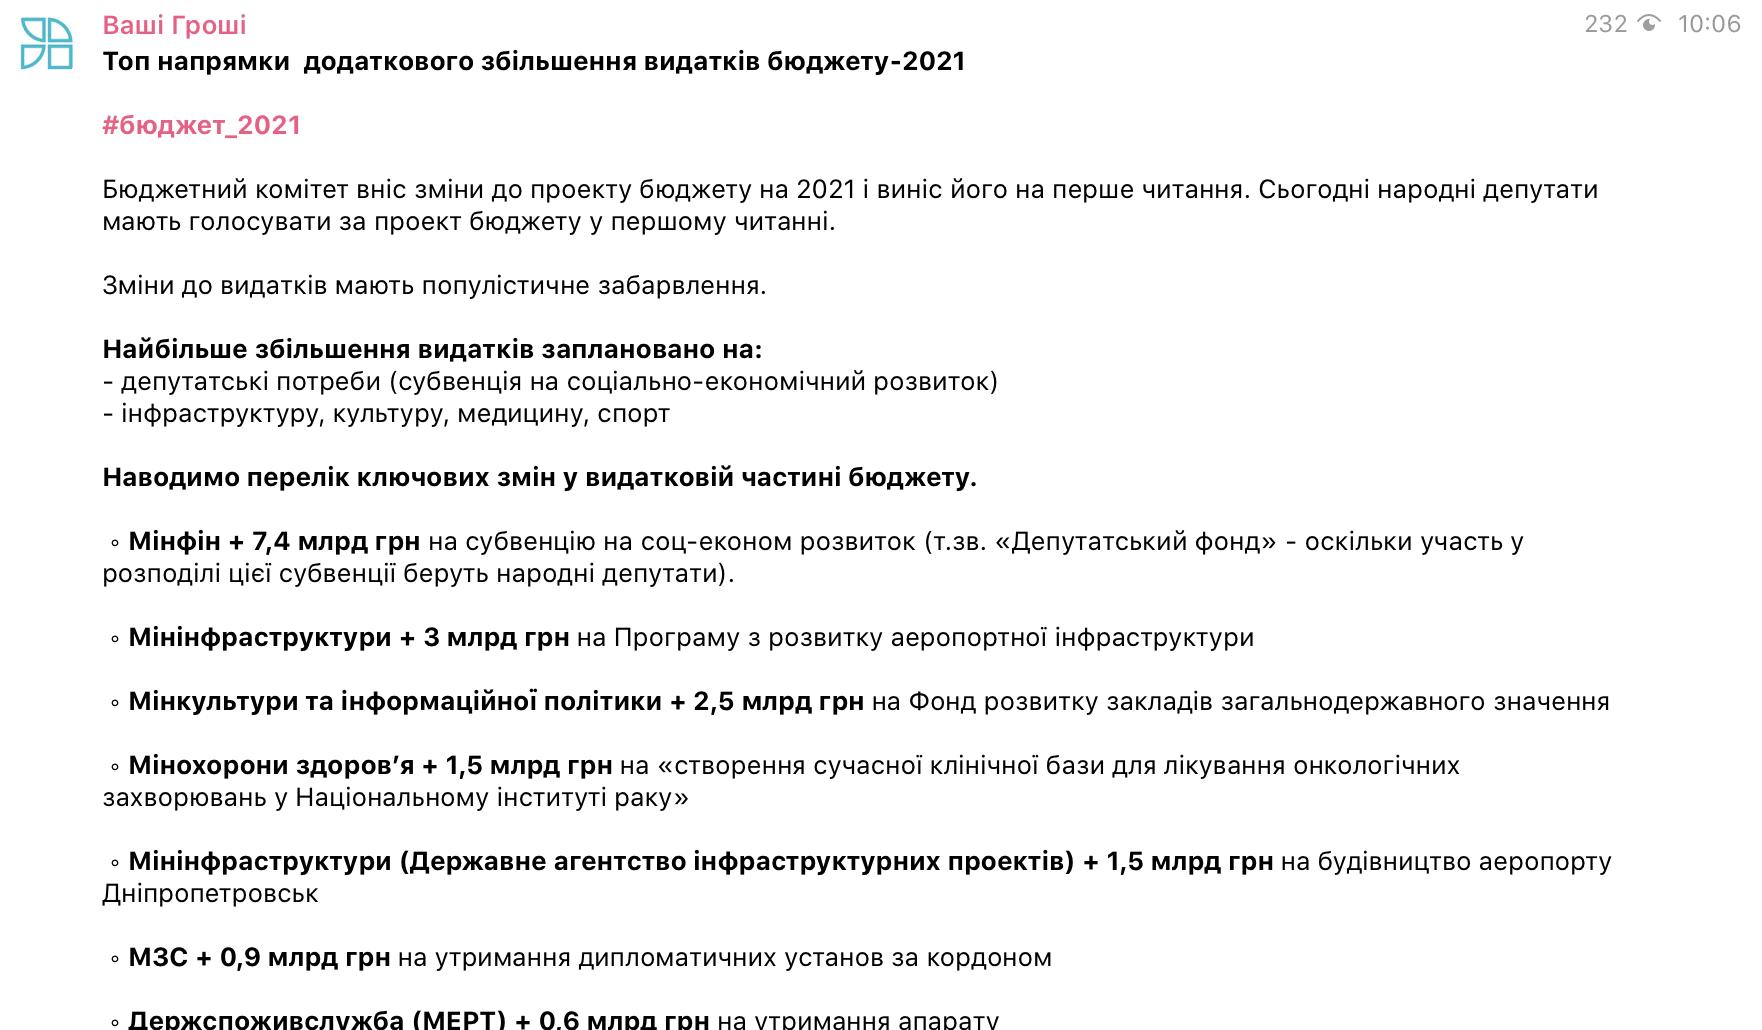 snimok-ekrana-2020-11-05-v-13-50-35.png